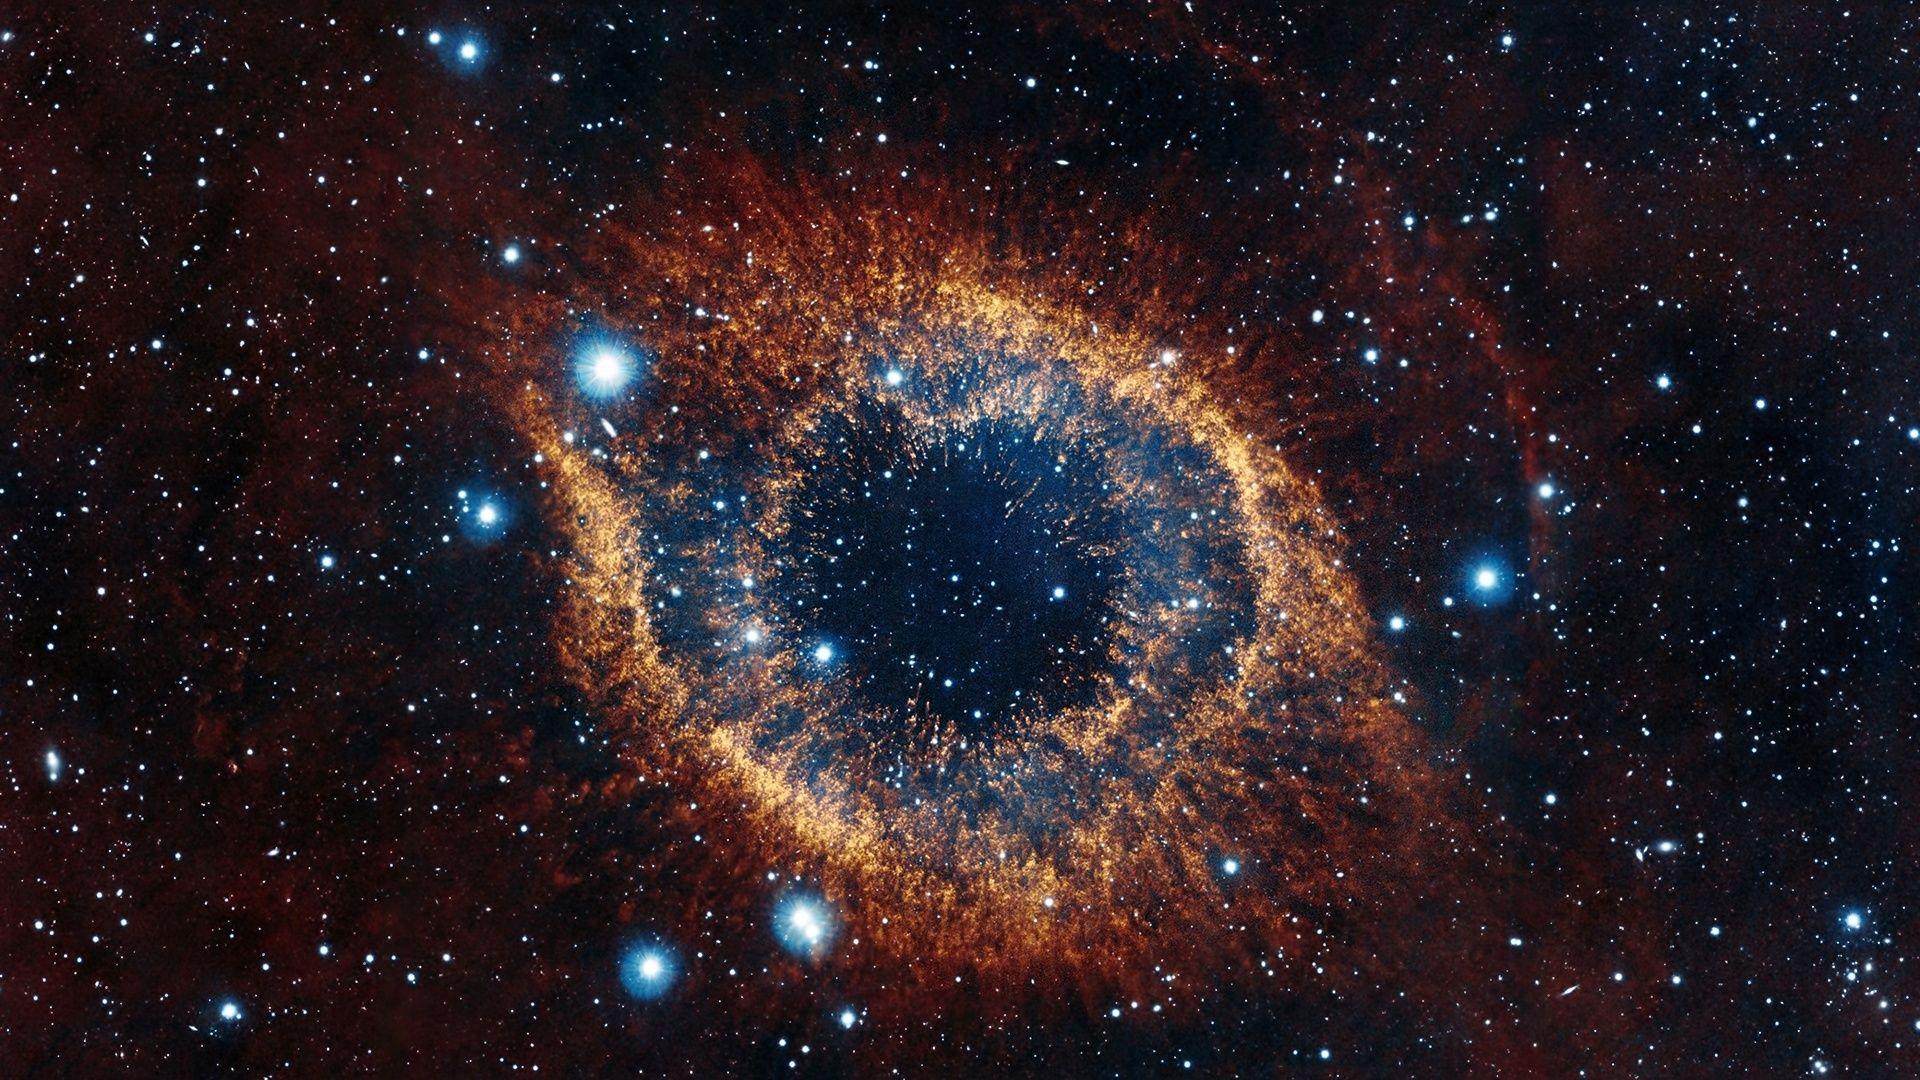 Nebulosa Hd, Fondos De Pantalla